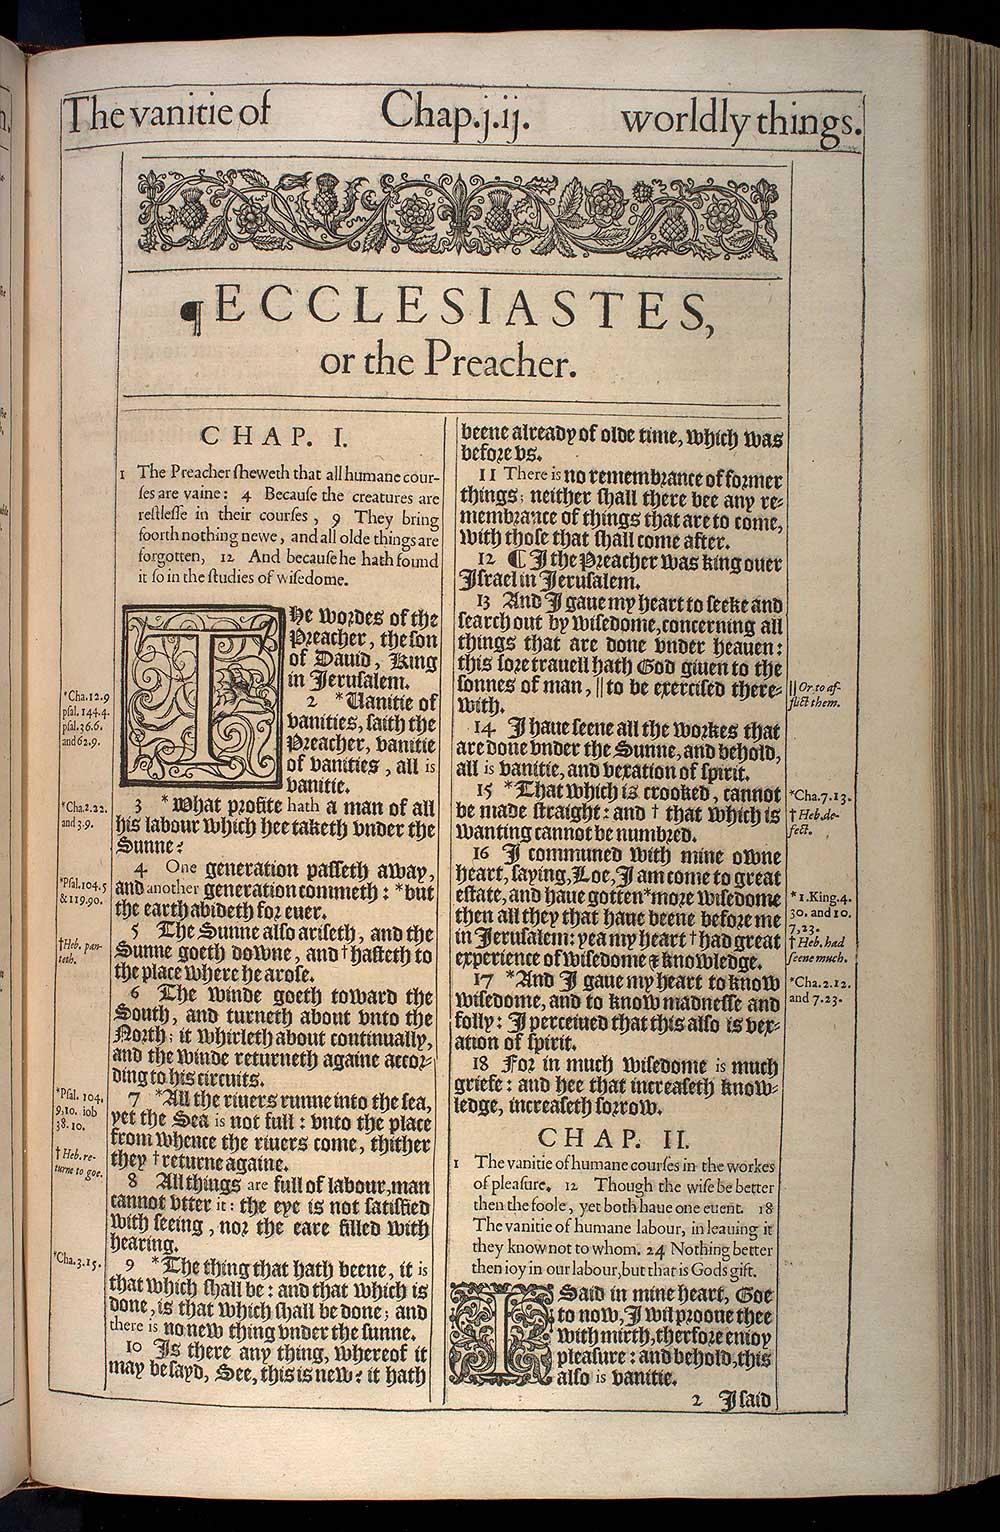 Ecclesiastes Chapter 2 Original 1611 Bible Scan